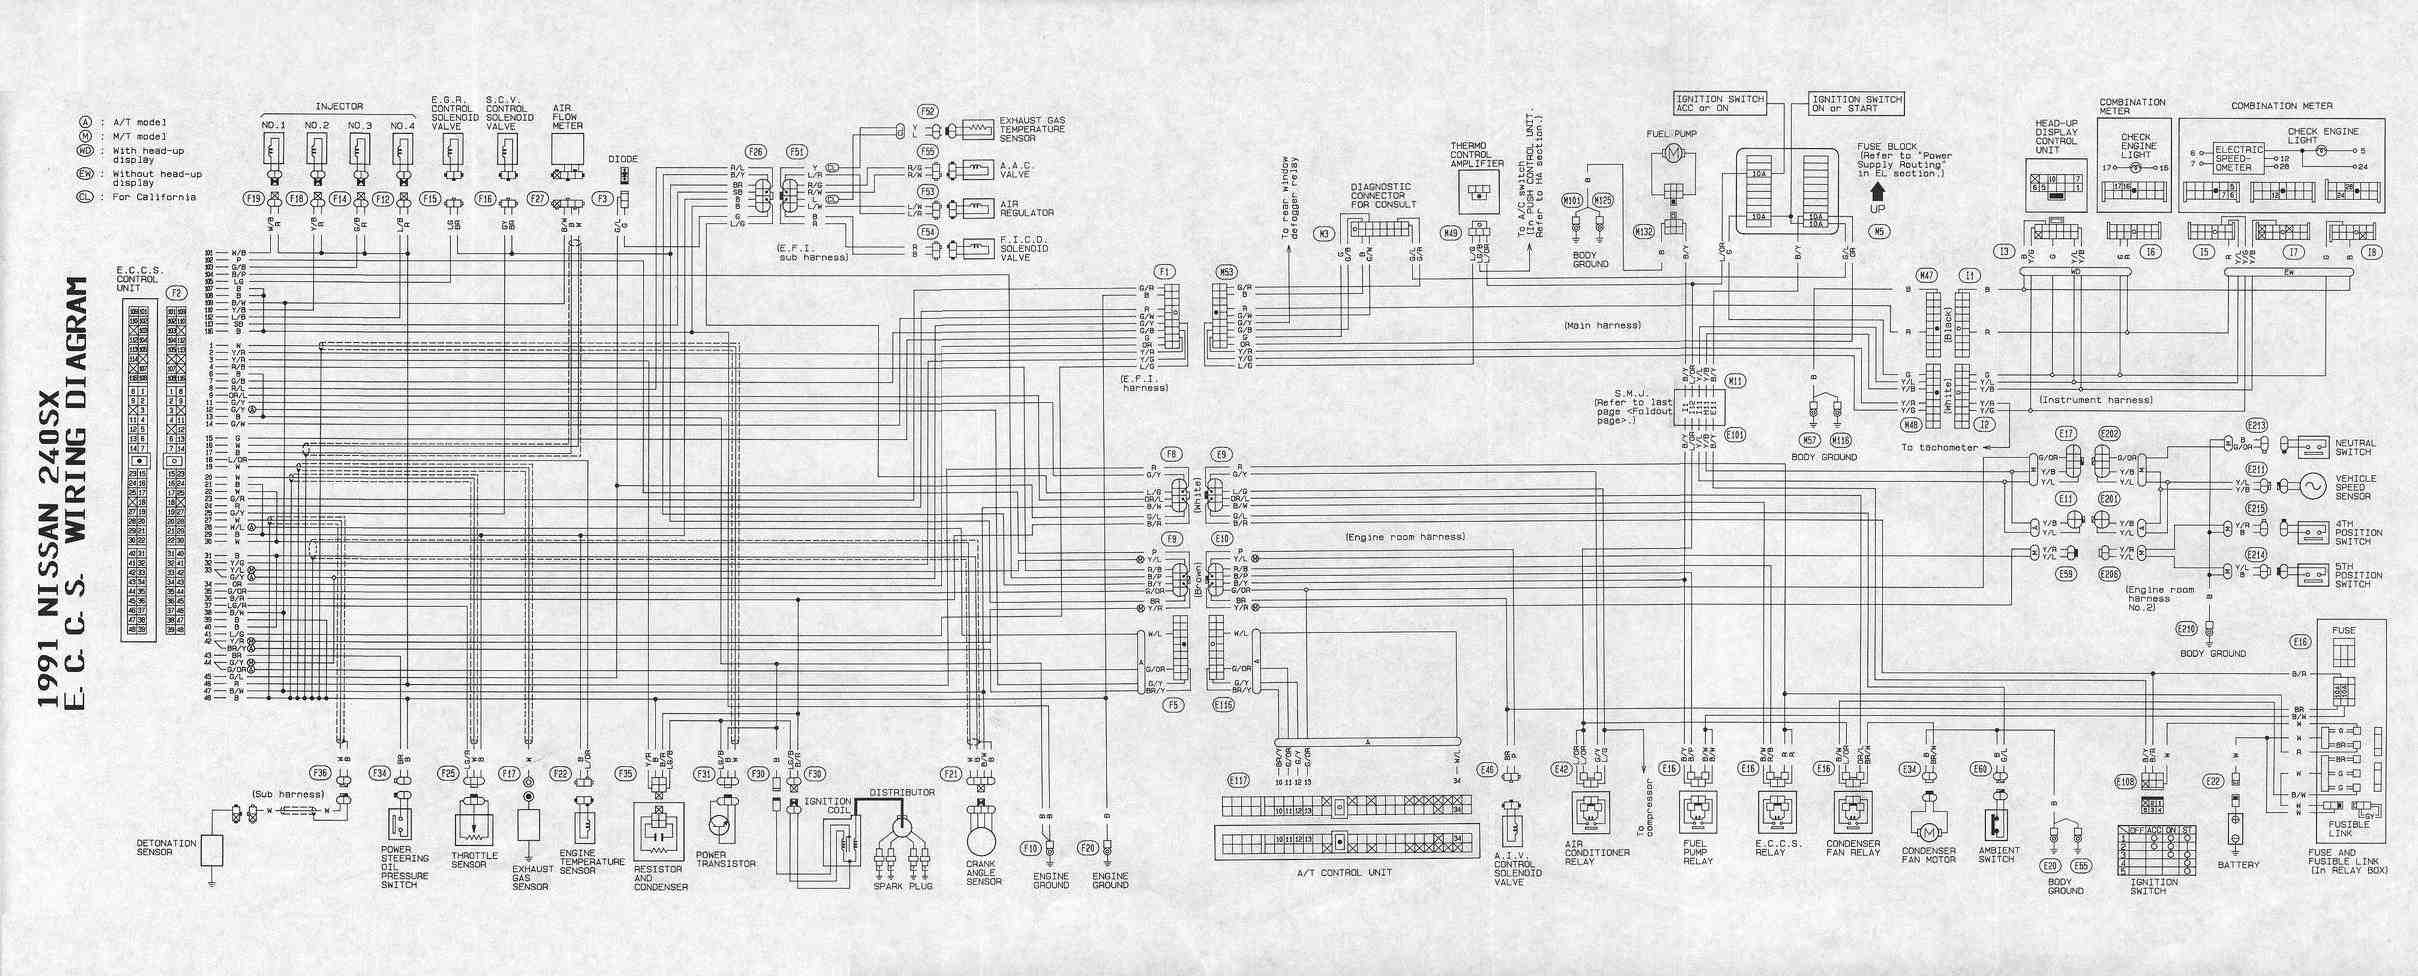 Modern Sr20de Wiring Diagram Image Collection - Electrical Diagram ...